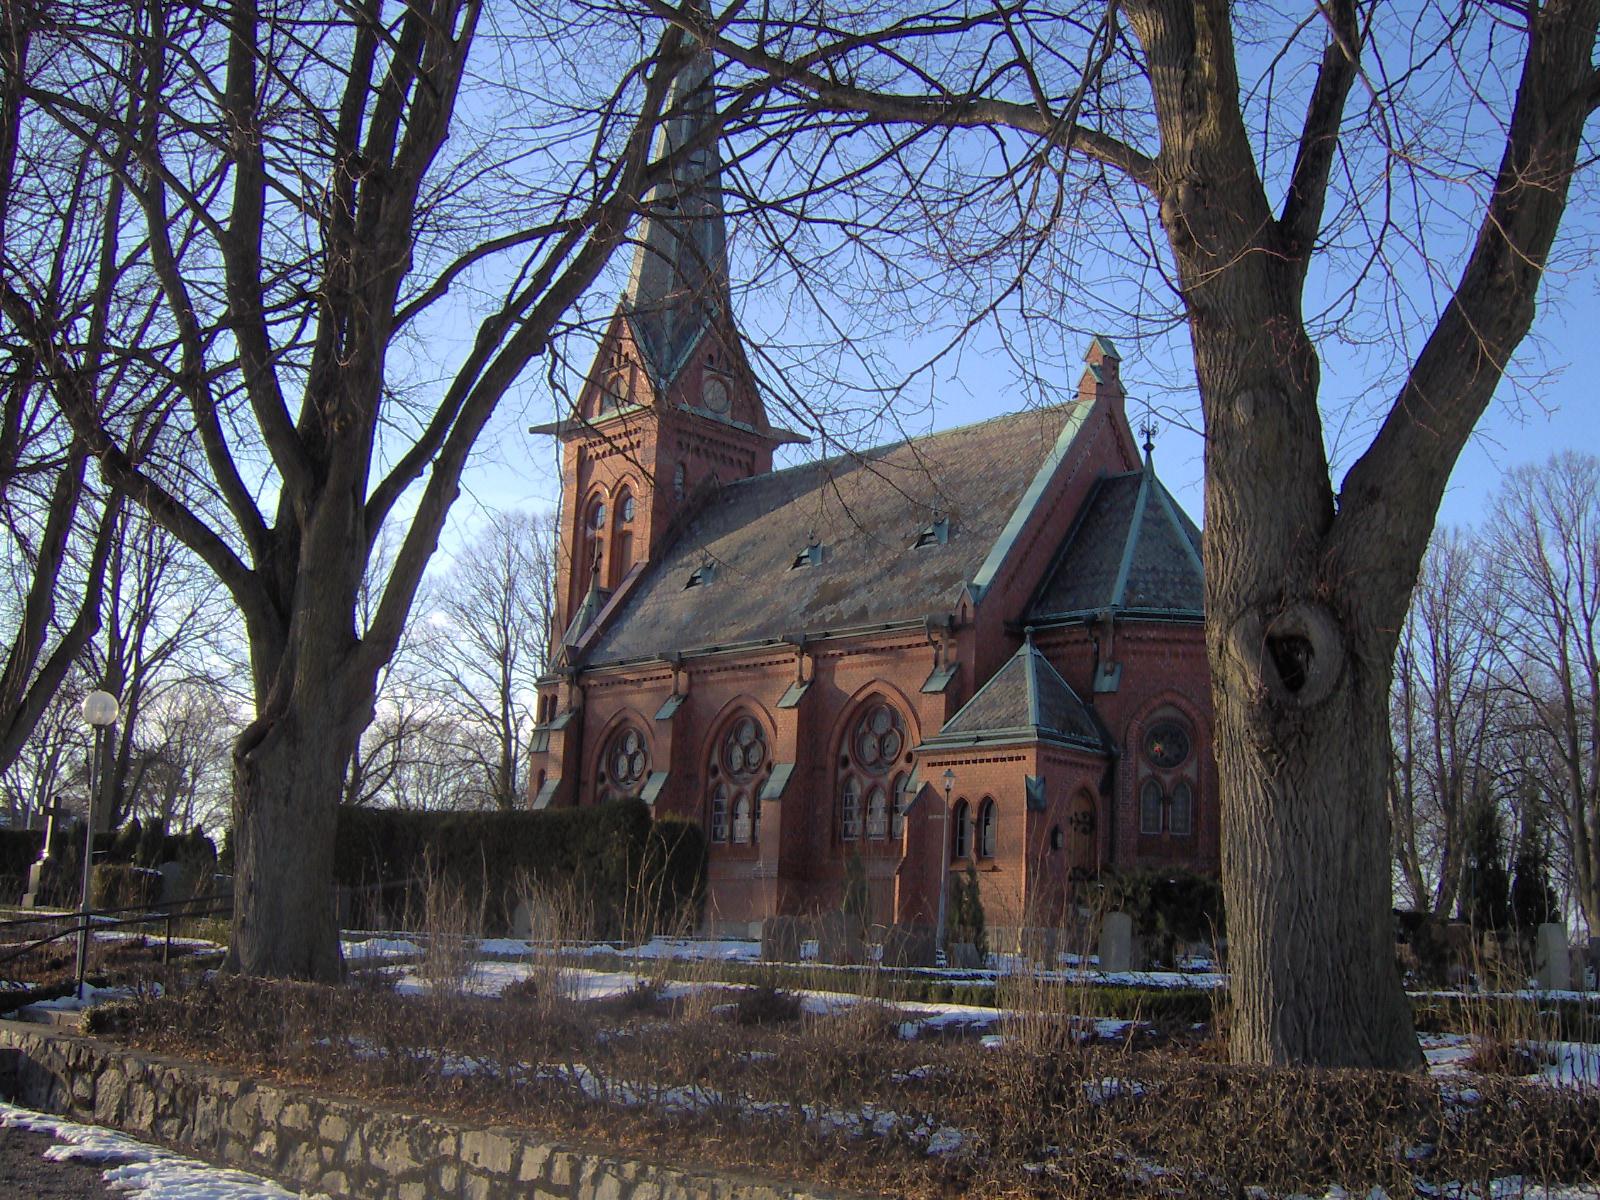 File:Norra Nbbelvs kyrka - KMB - satisfaction-survey.net